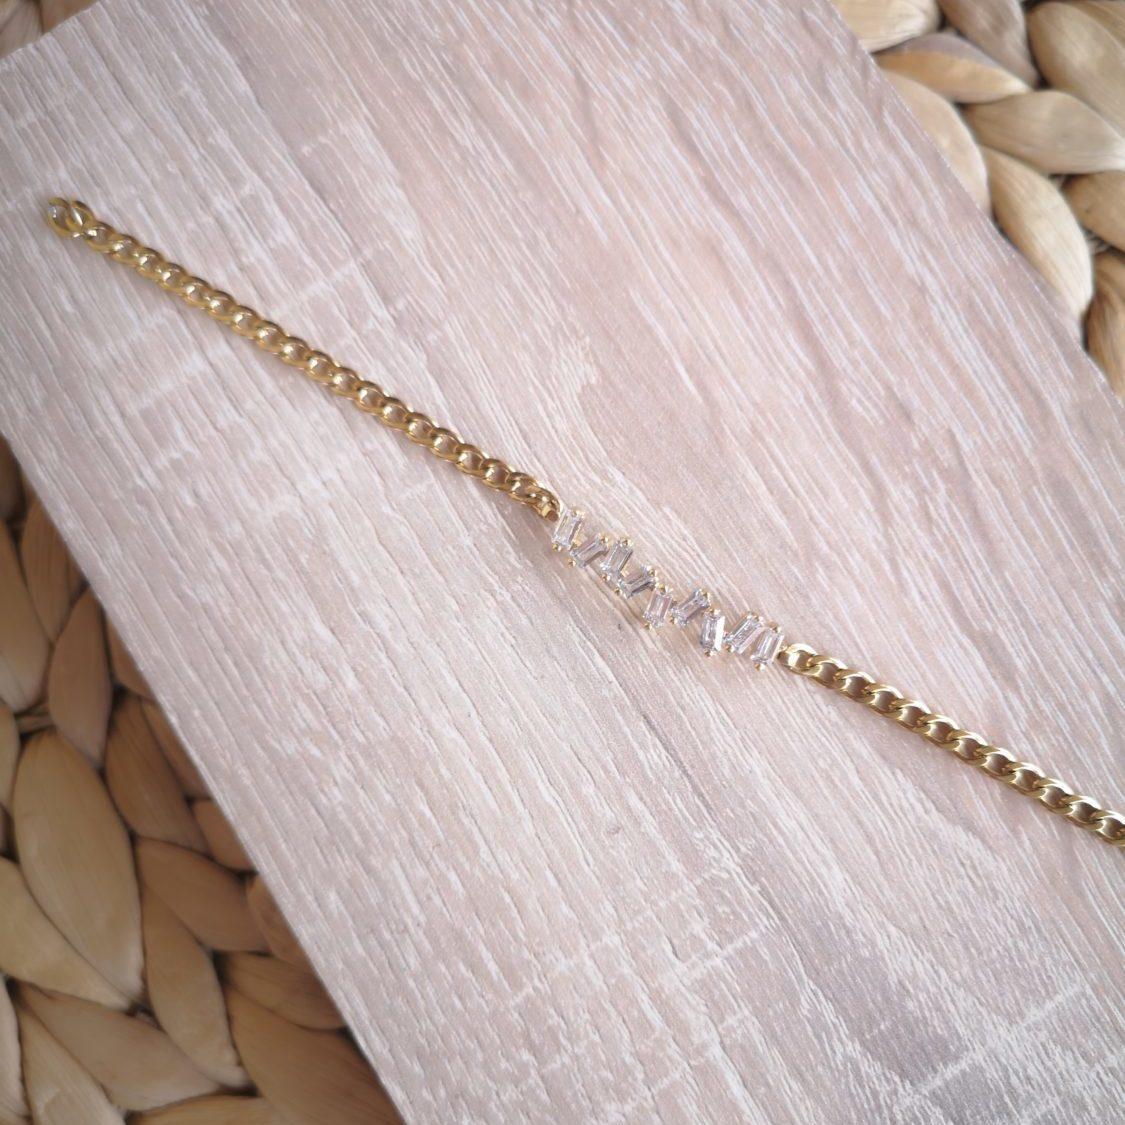 Gold Zircon Label Bracelet